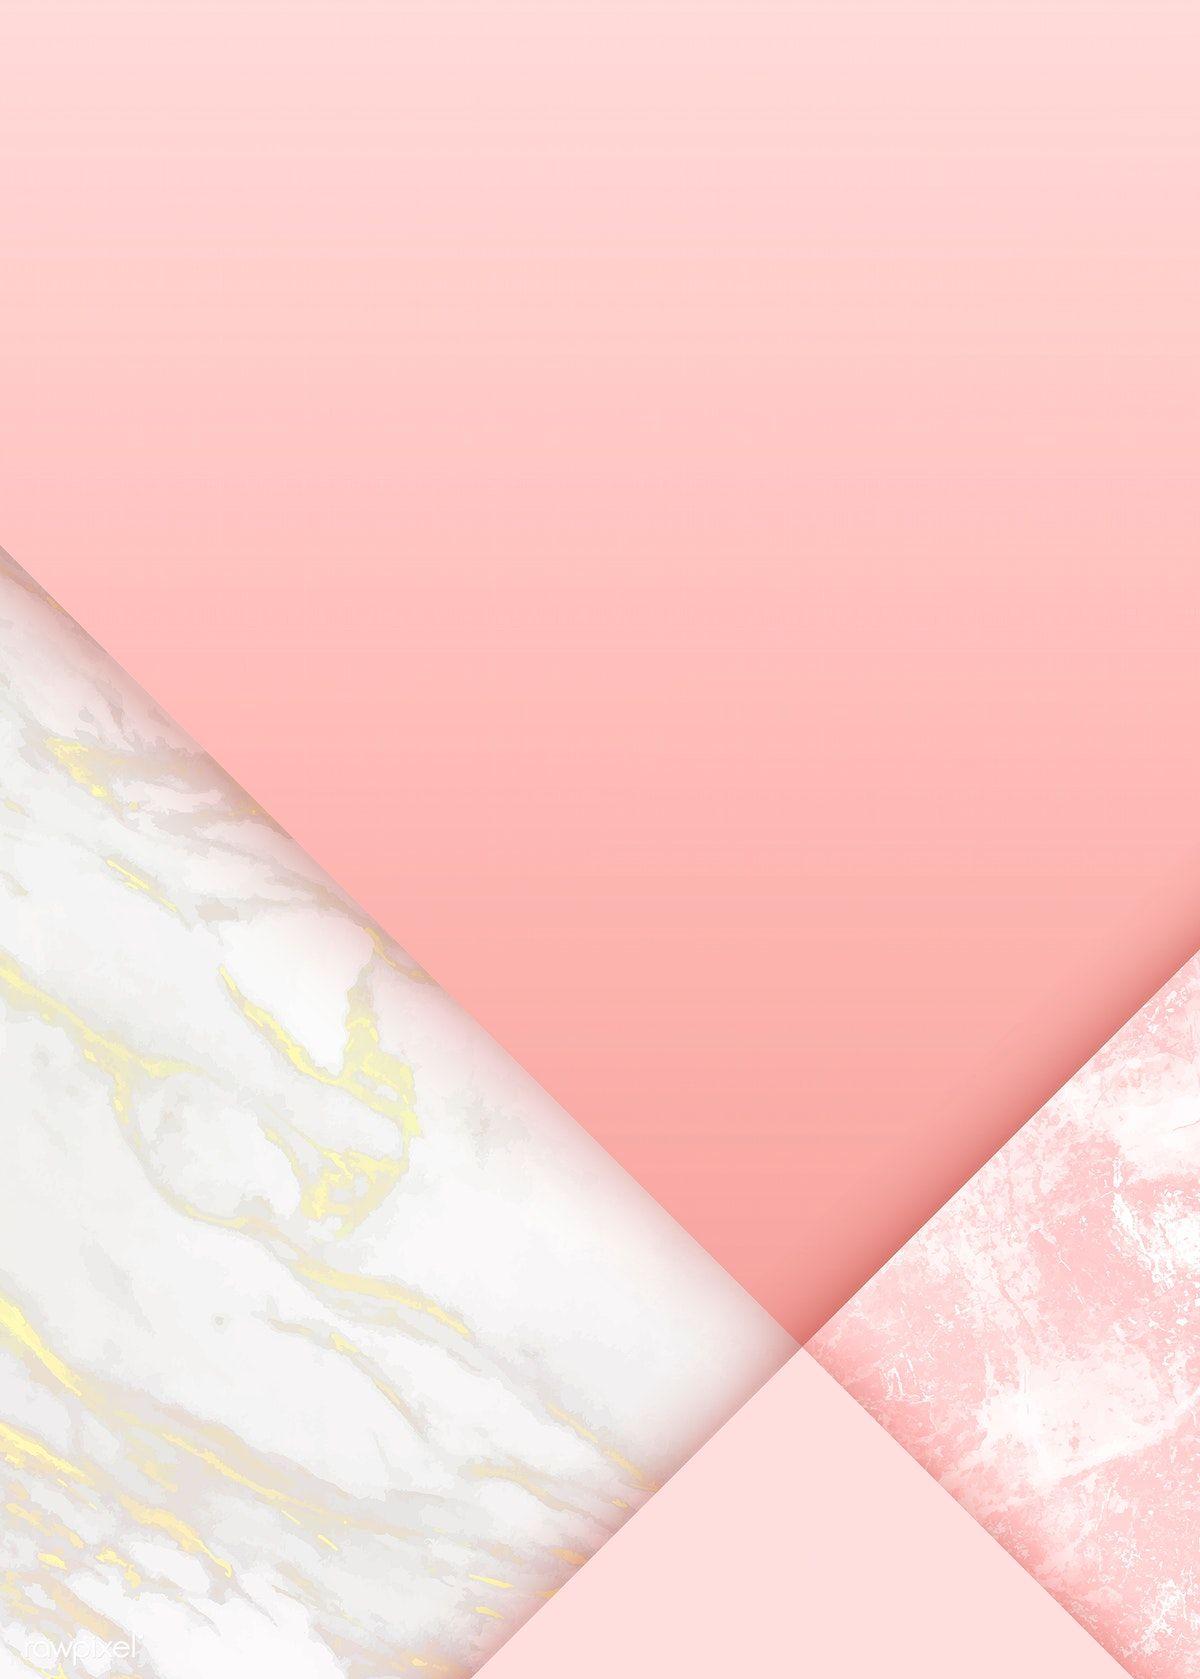 Pink Feminine Geometric Background Vector Free Image By Rawpixel Com Niwat Geometric Background Wallpaper Design Pattern Trendy Wallpaper Pattern